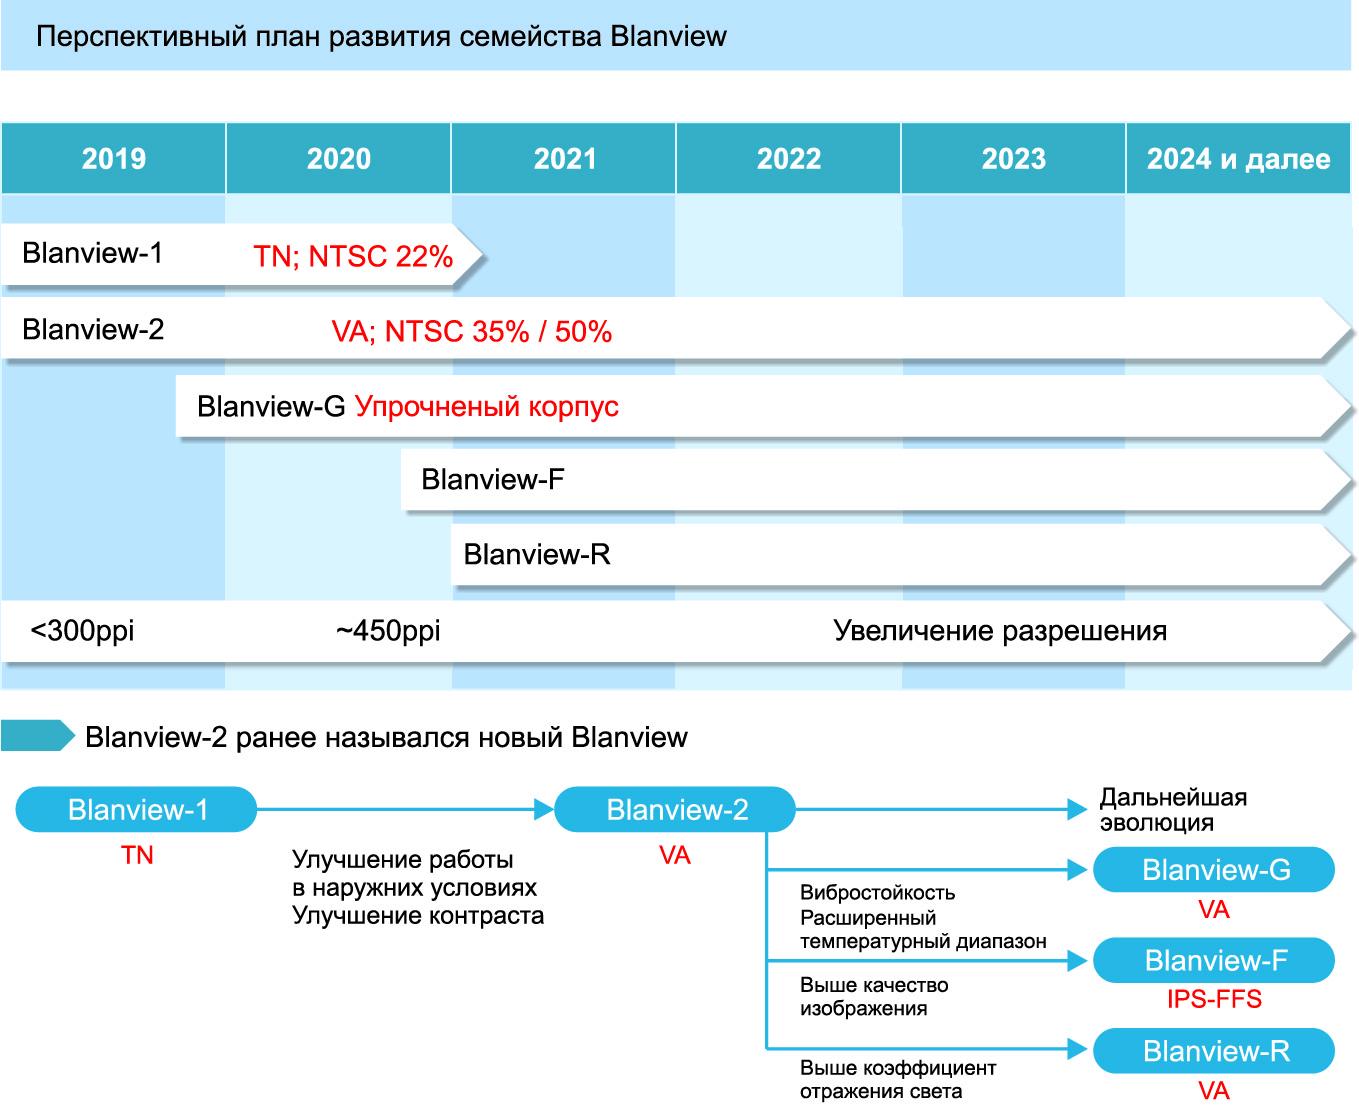 Перспективный план развития технологии Blanview